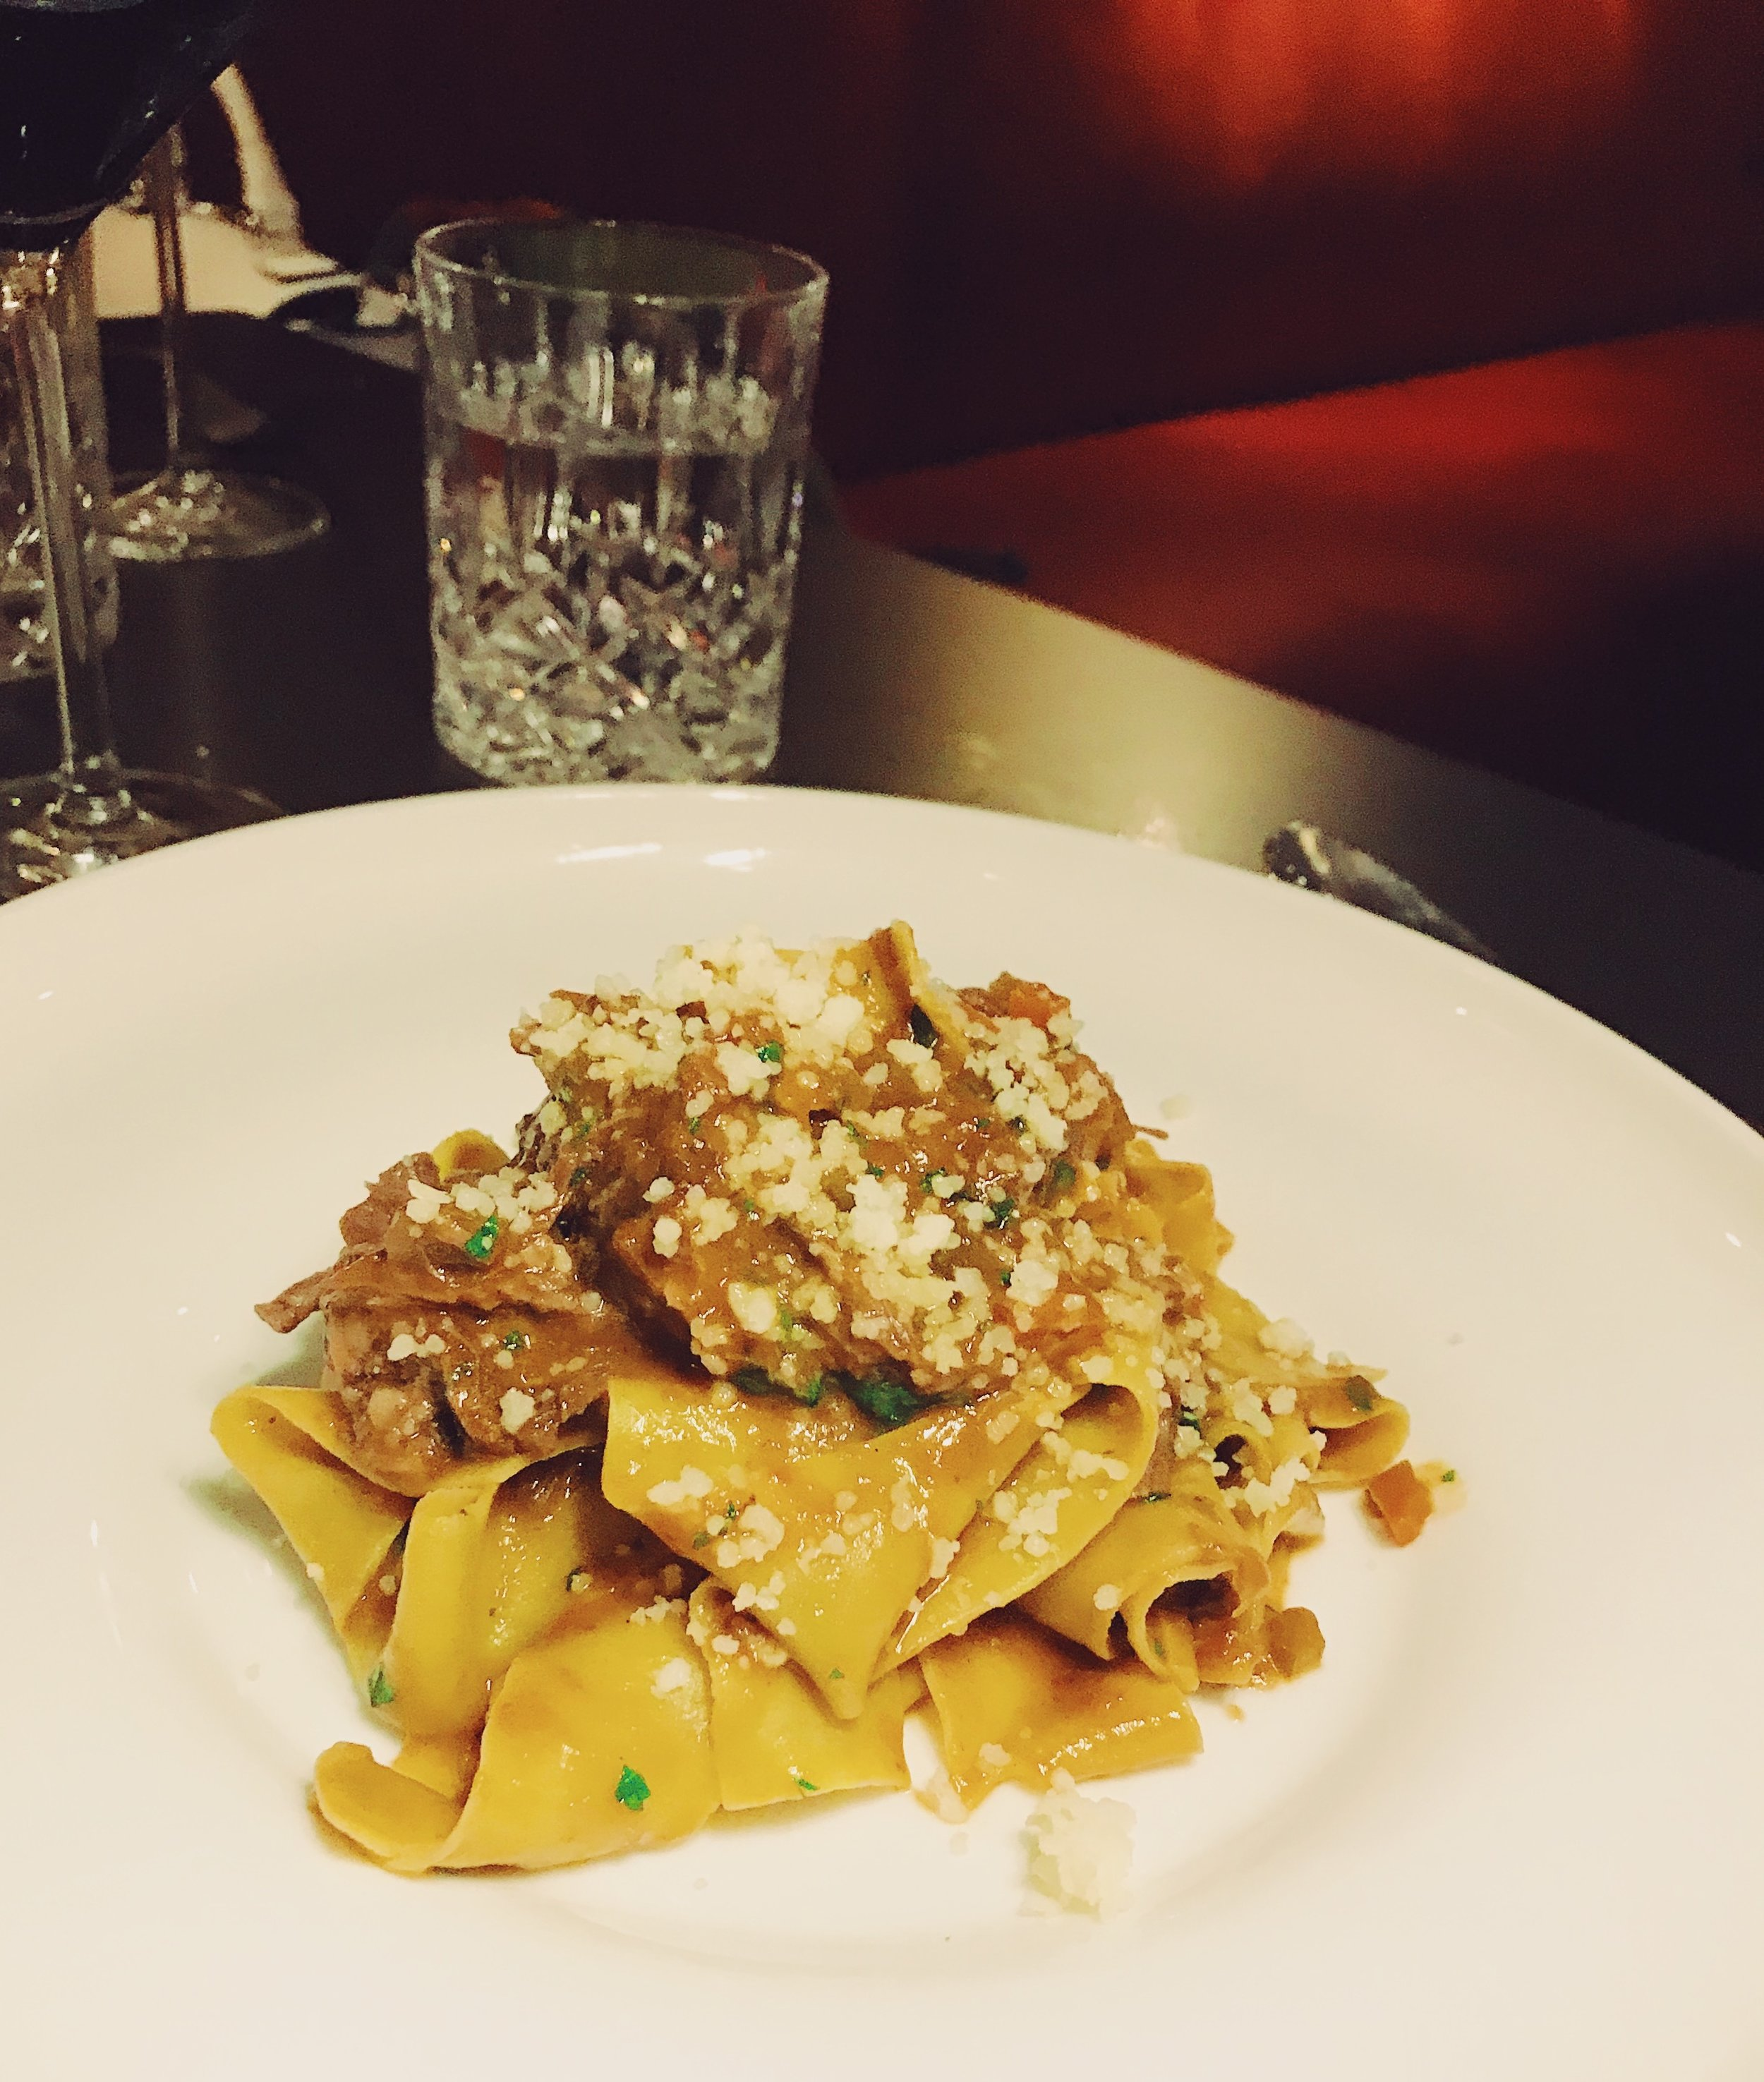 I Love That For You - Josephine Wine Bar Entree Pasta.jpg